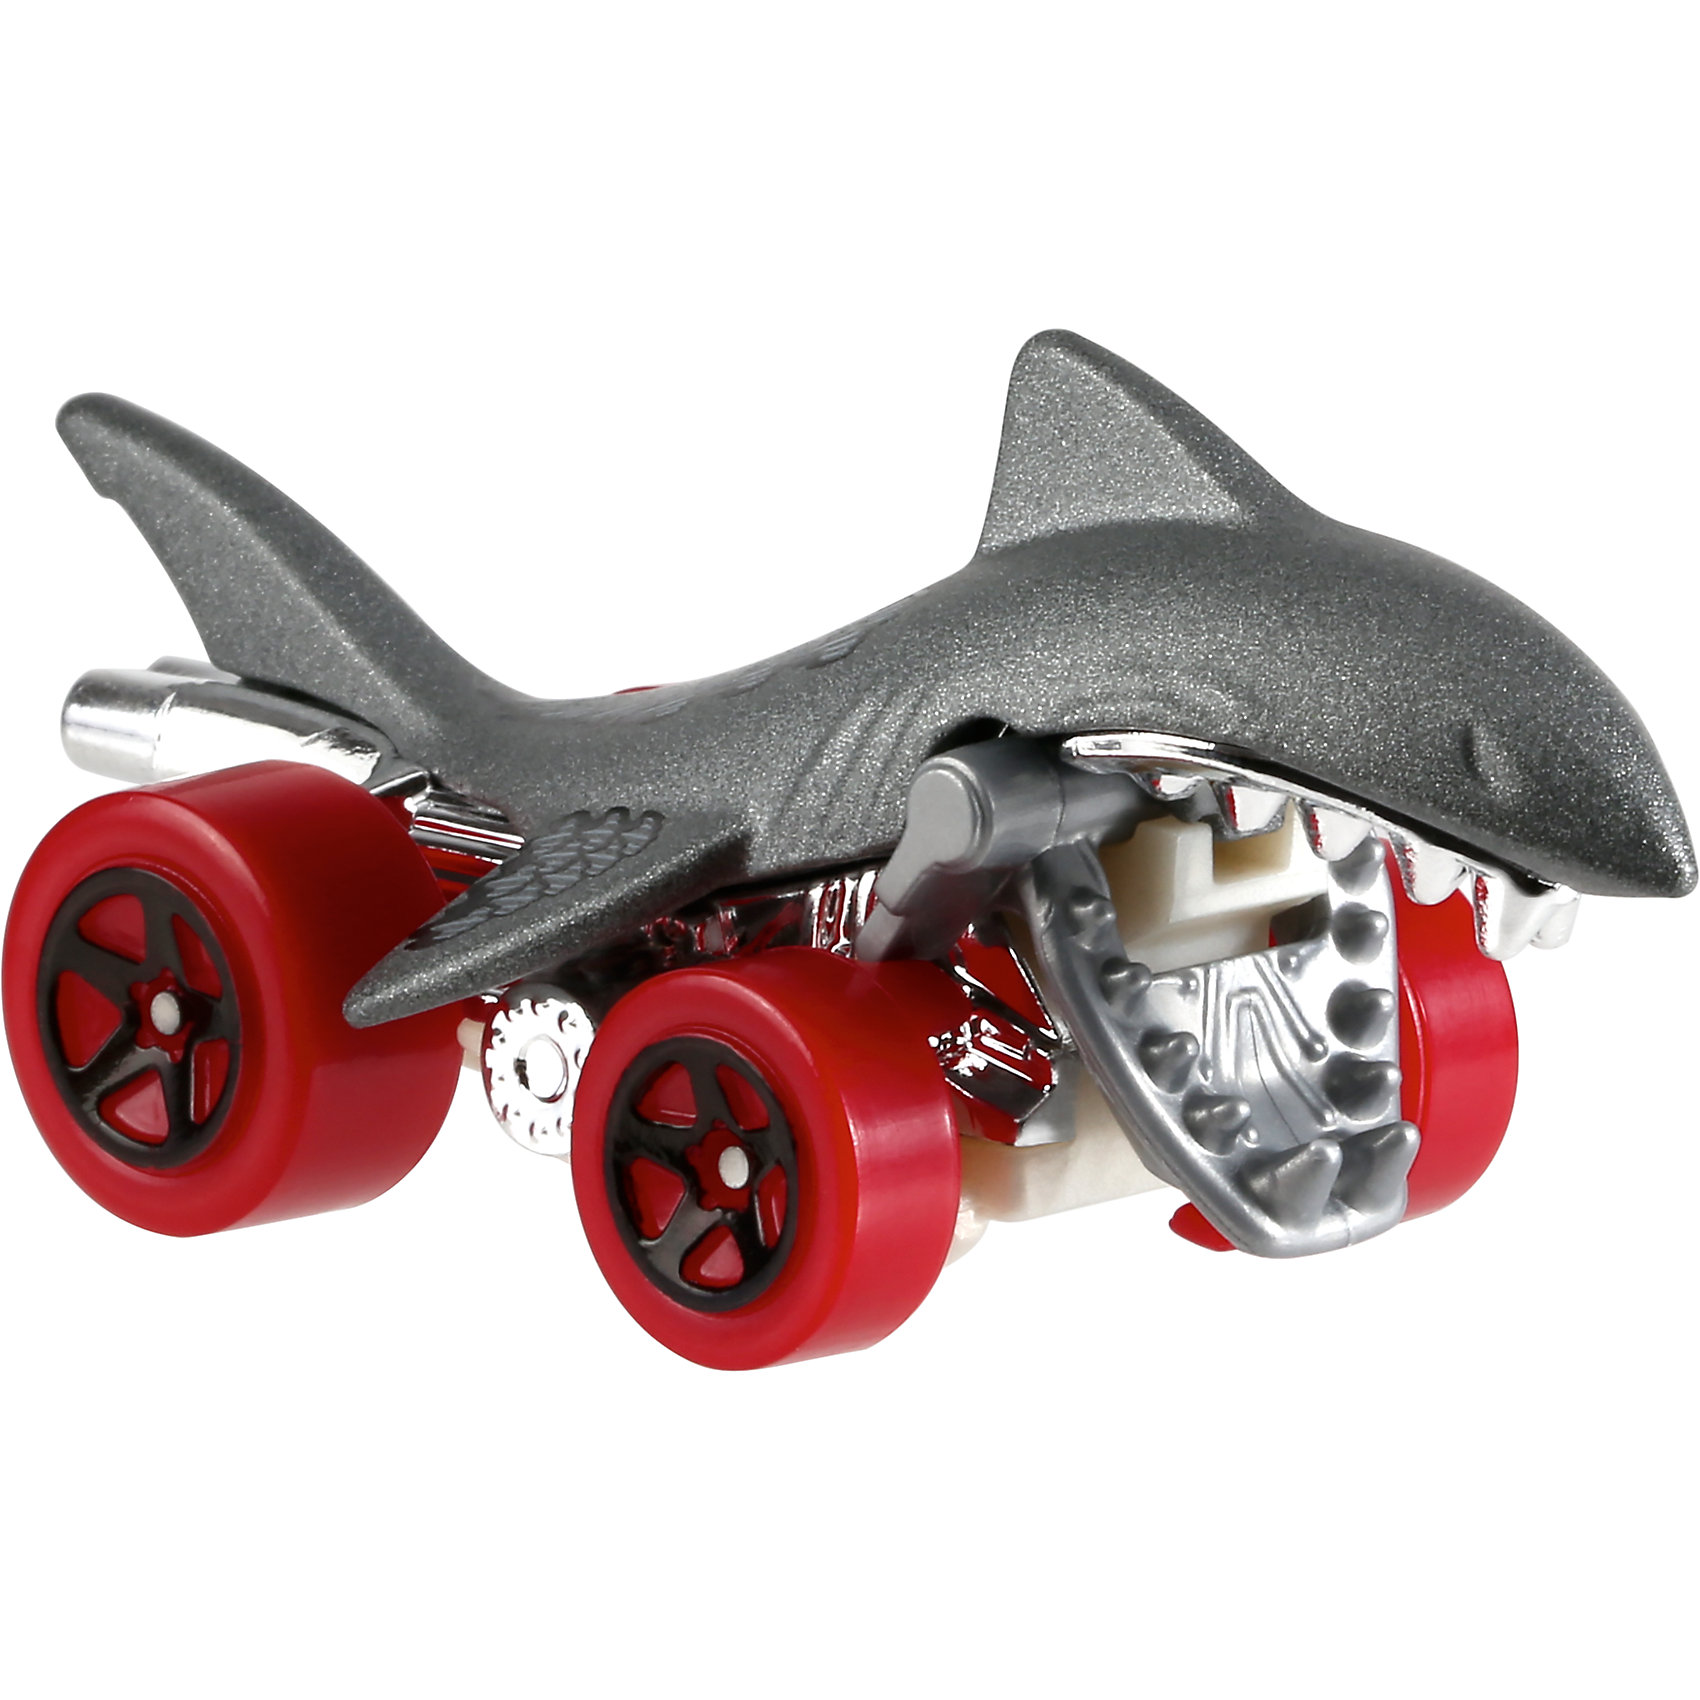 Базовая машинка Hot Wheels, Shark BiteМашинки<br><br><br>Ширина мм: 110<br>Глубина мм: 45<br>Высота мм: 110<br>Вес г: 30<br>Возраст от месяцев: 36<br>Возраст до месяцев: 96<br>Пол: Мужской<br>Возраст: Детский<br>SKU: 7111096